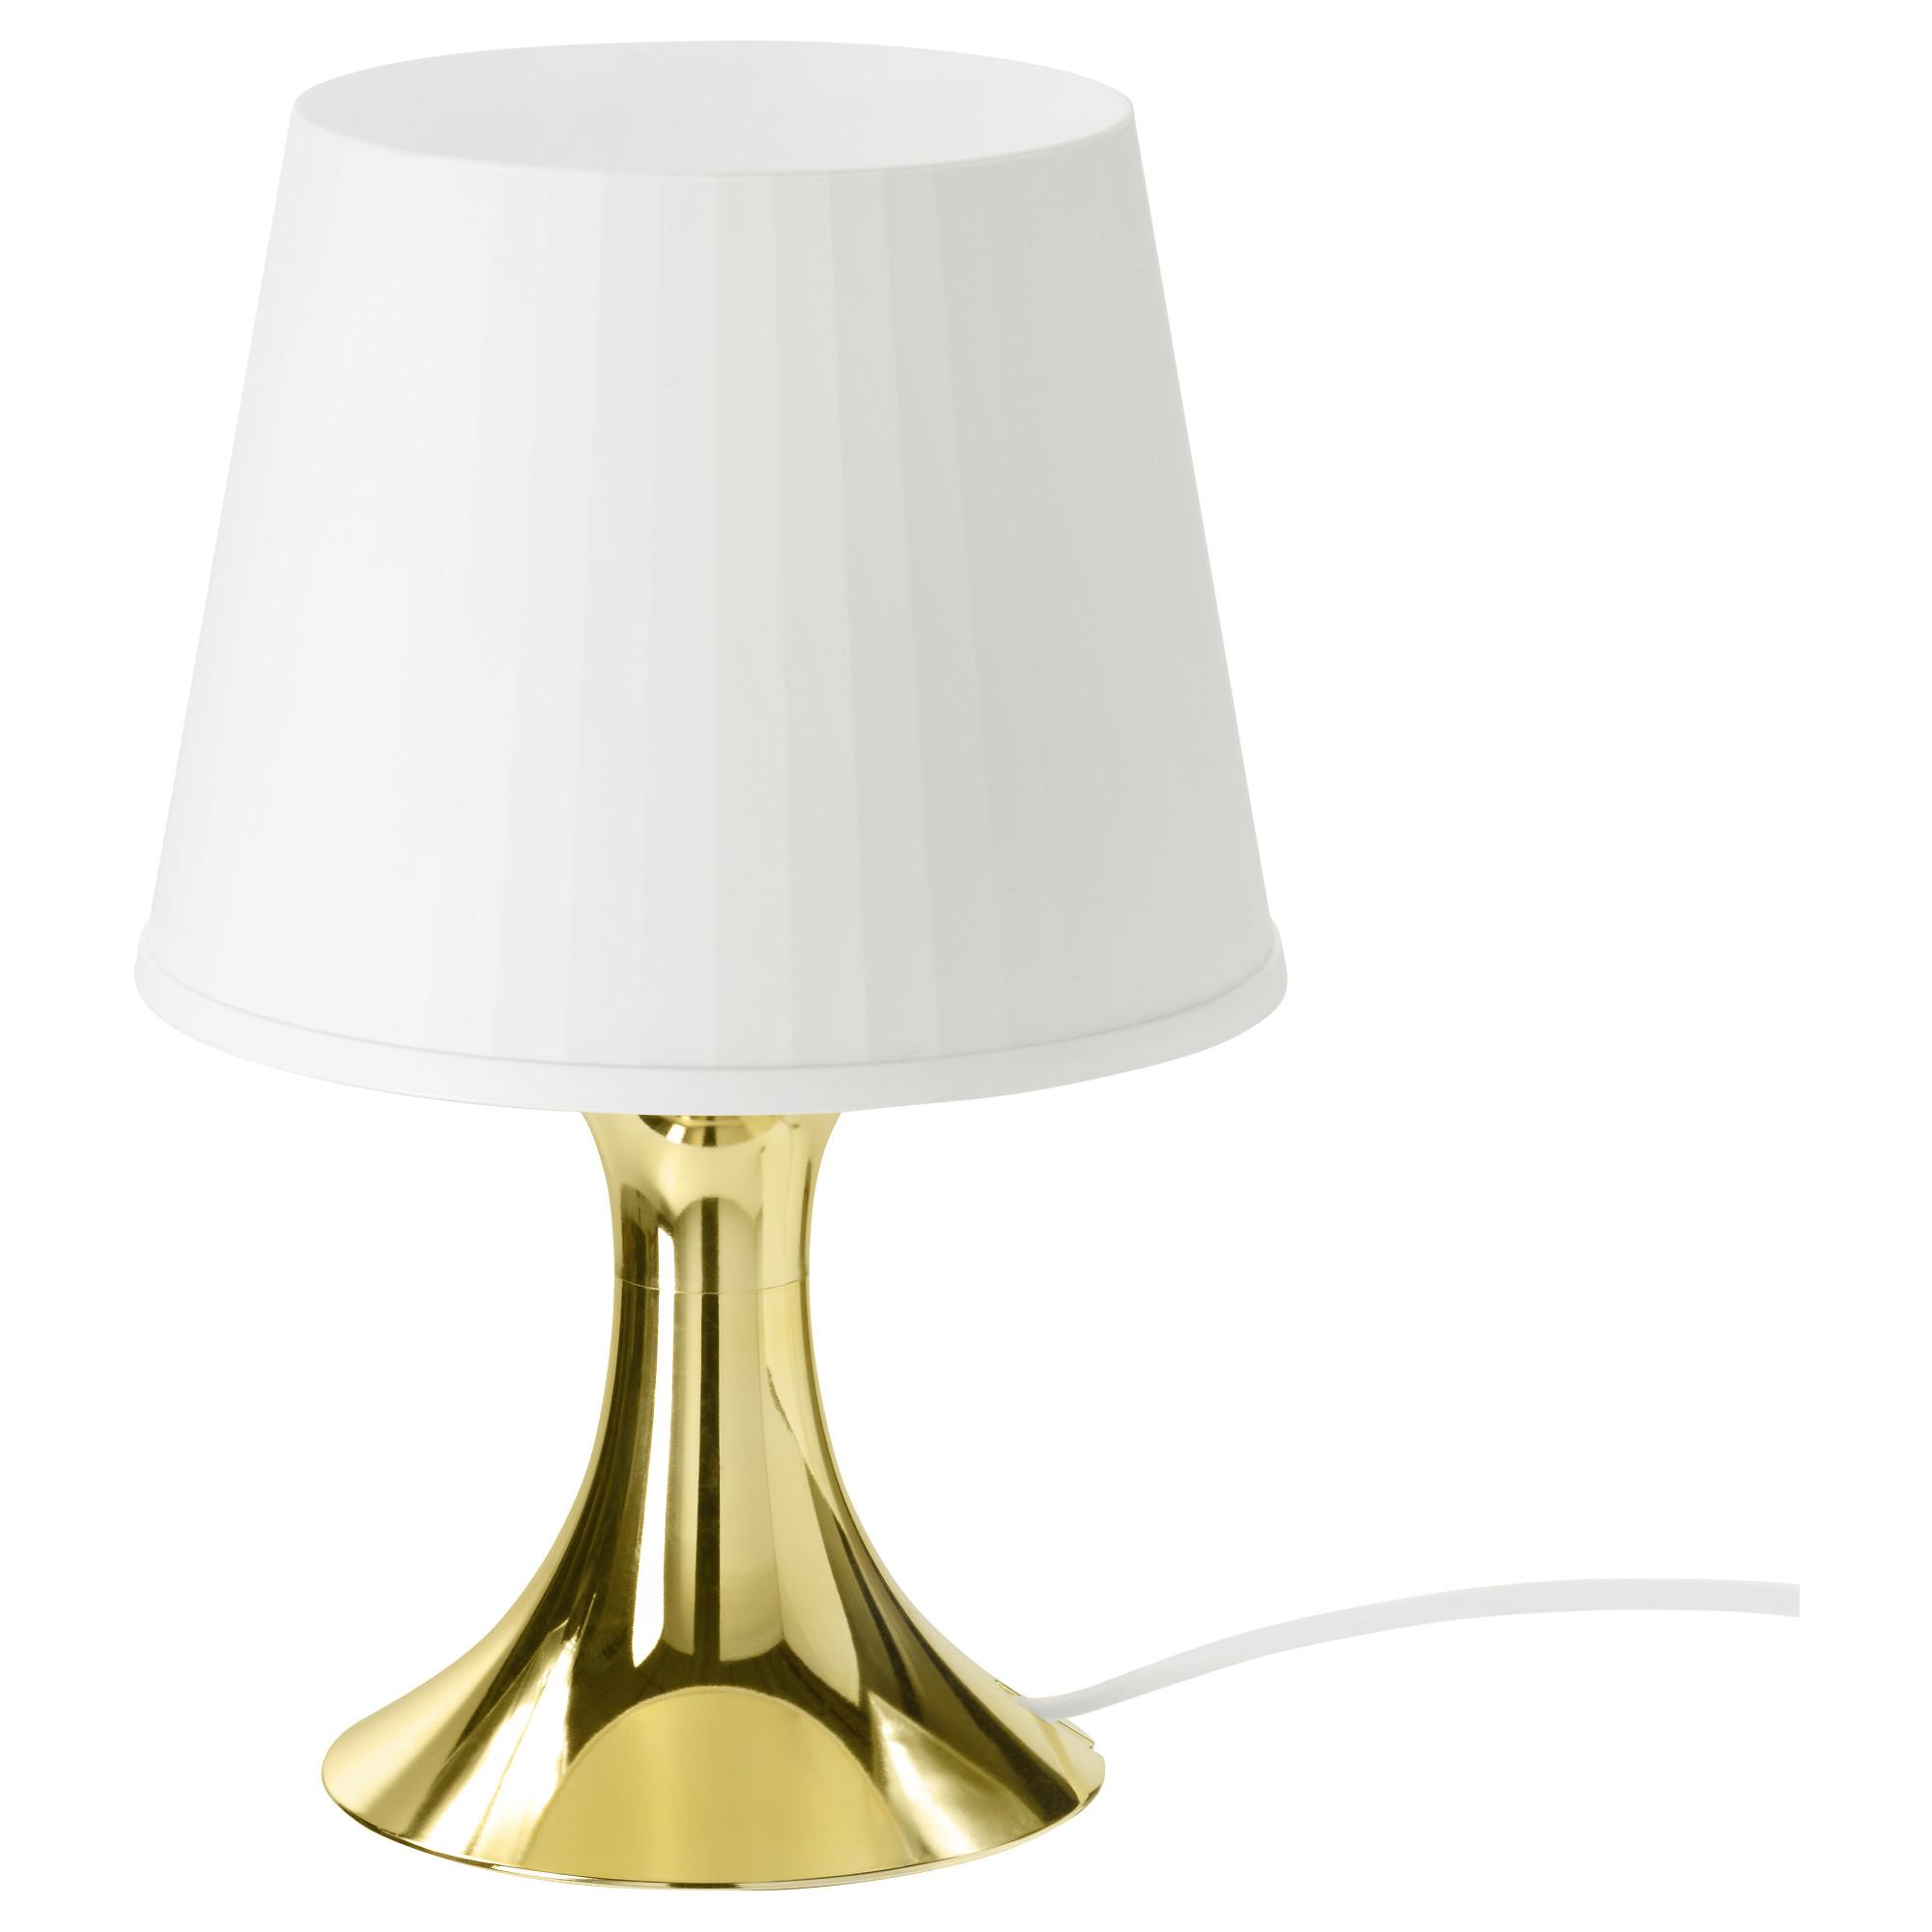 70342439 POÄNG Table Lamps IKEA khmer in phnom penh cambodia